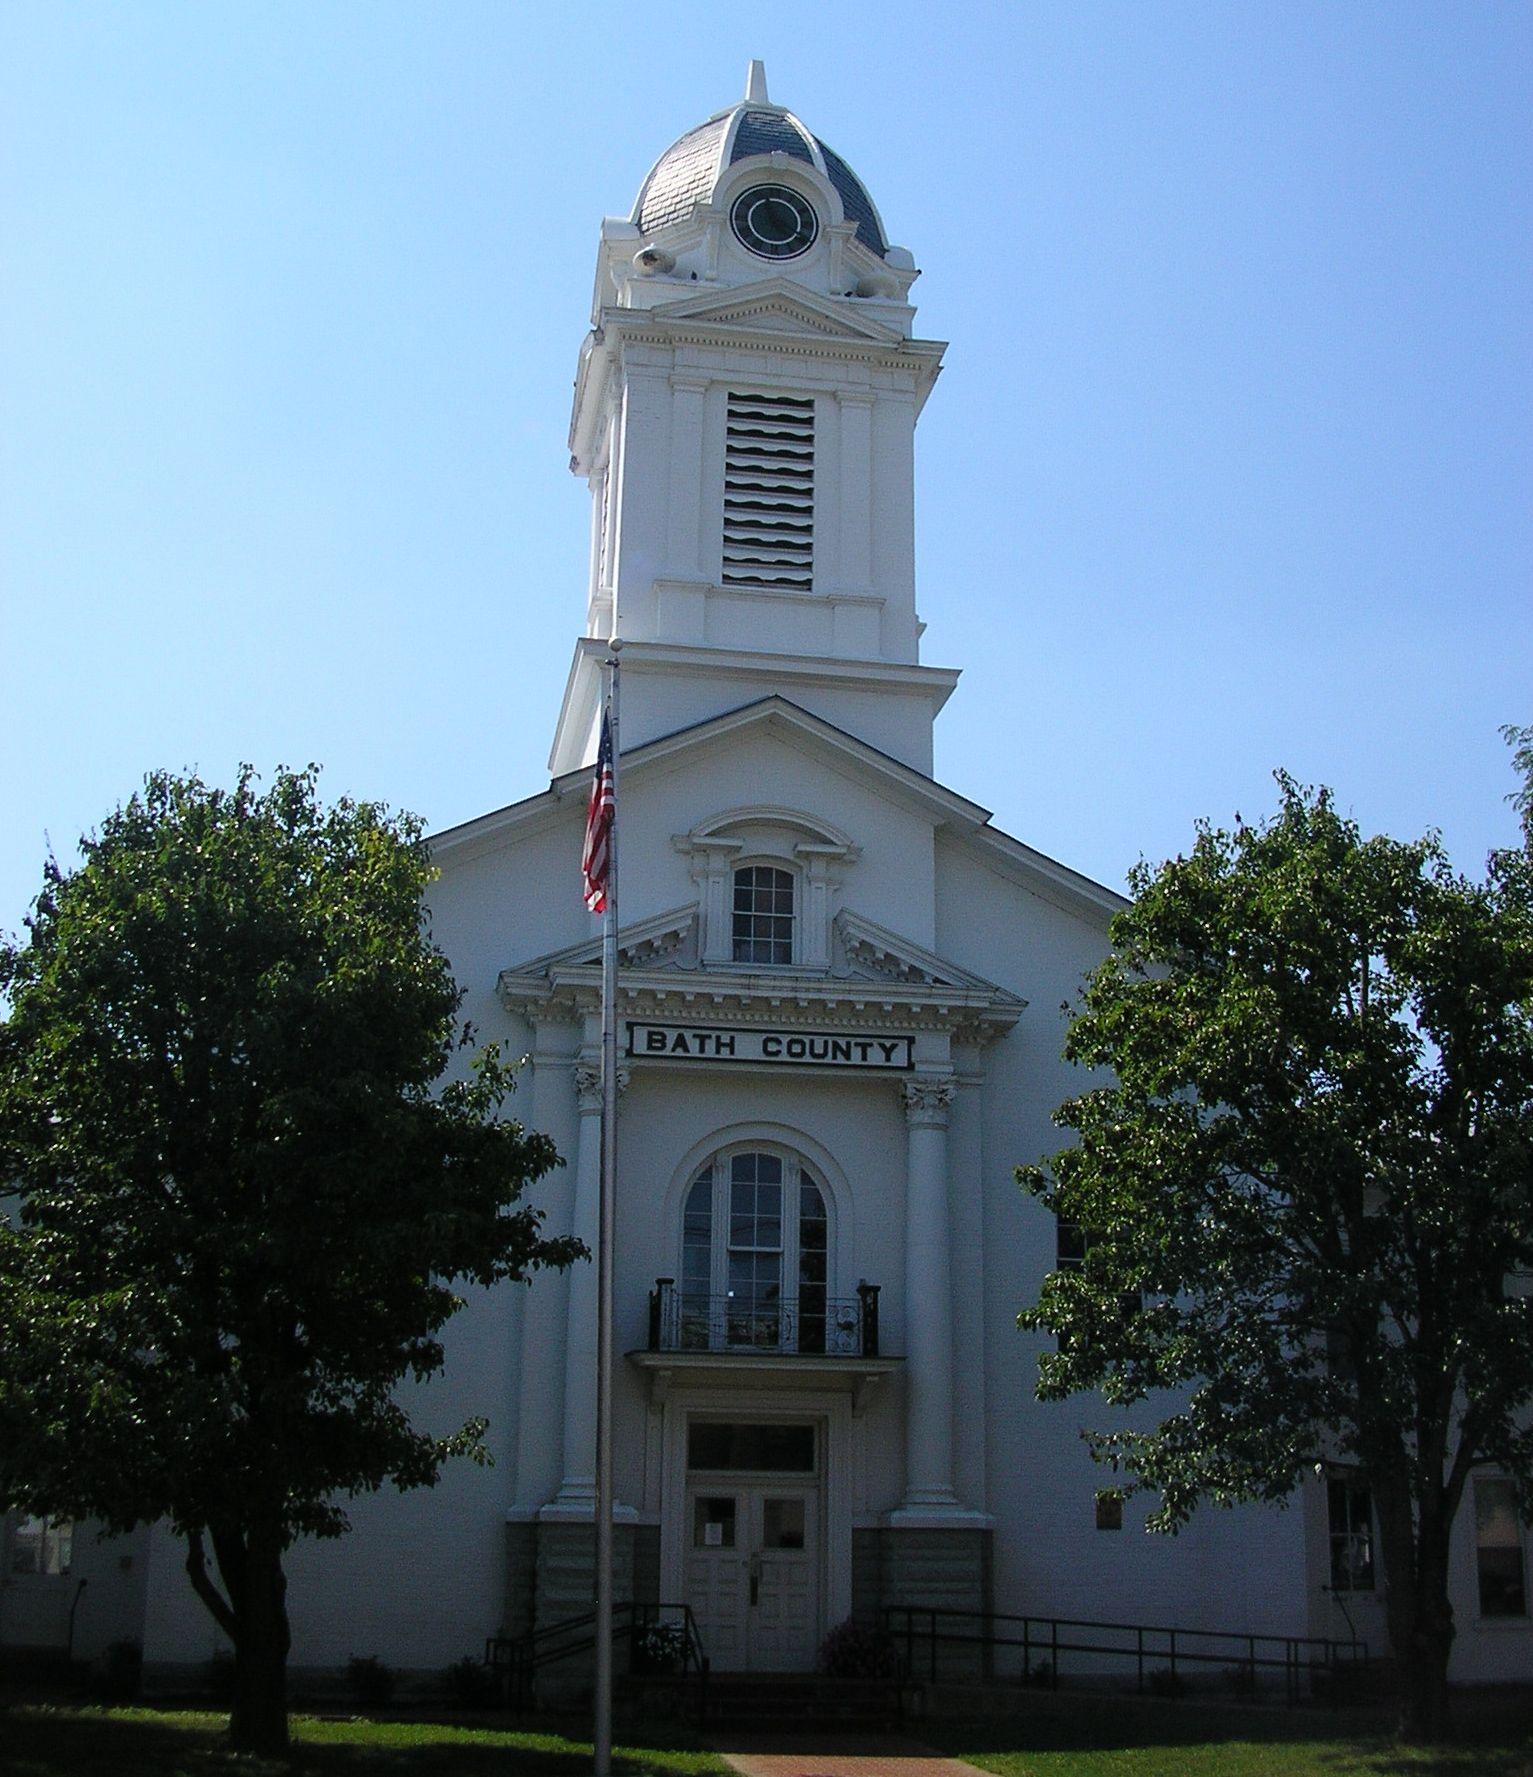 Bath County Kentucky Wikipedia